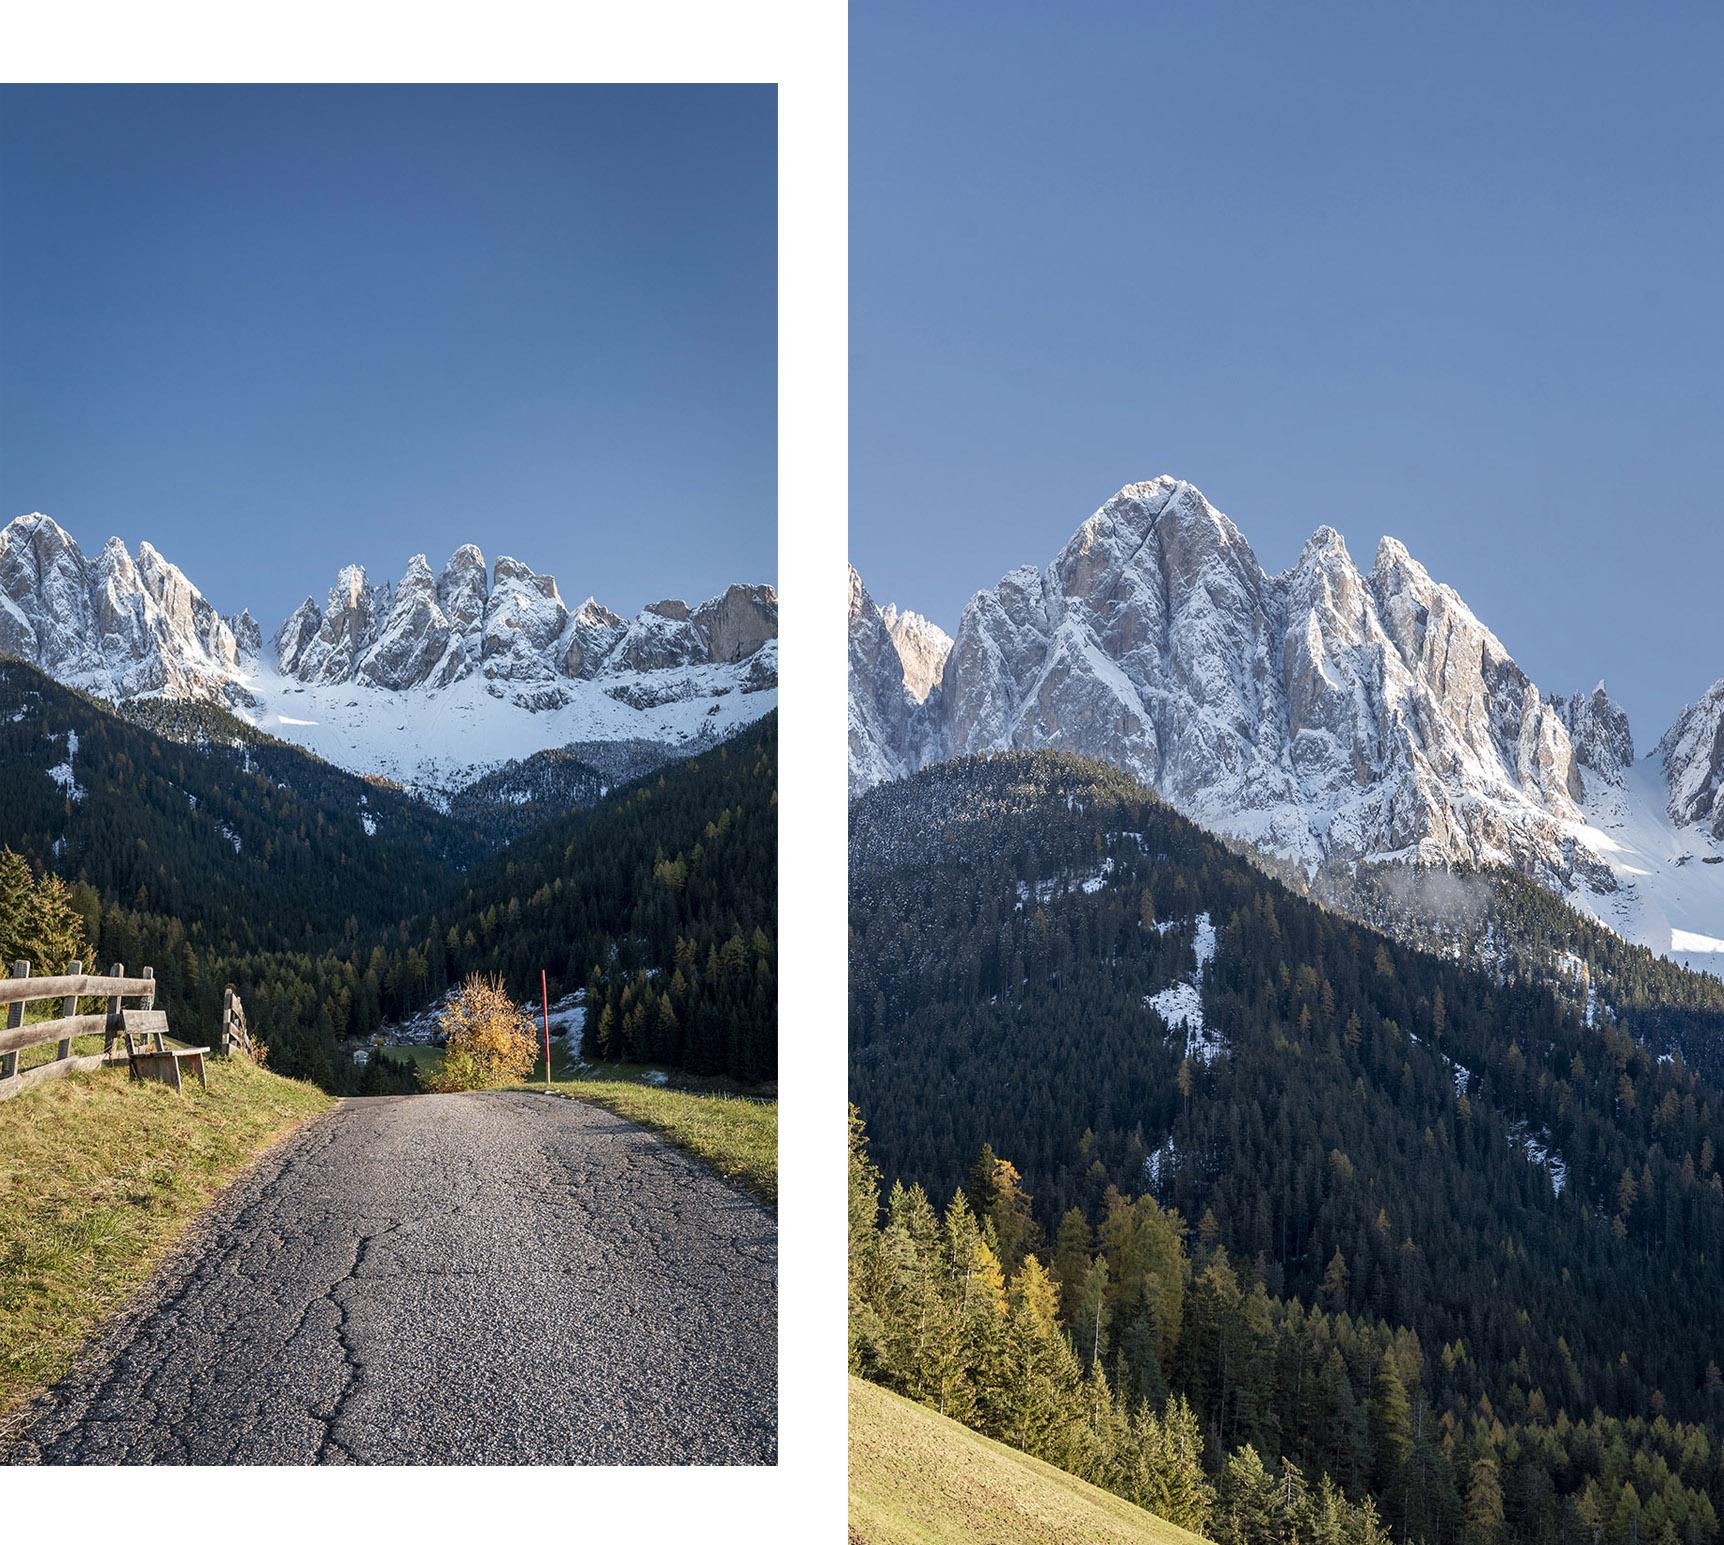 Italie Sud Tyrol route banc chemin vue sapins montagnes neige